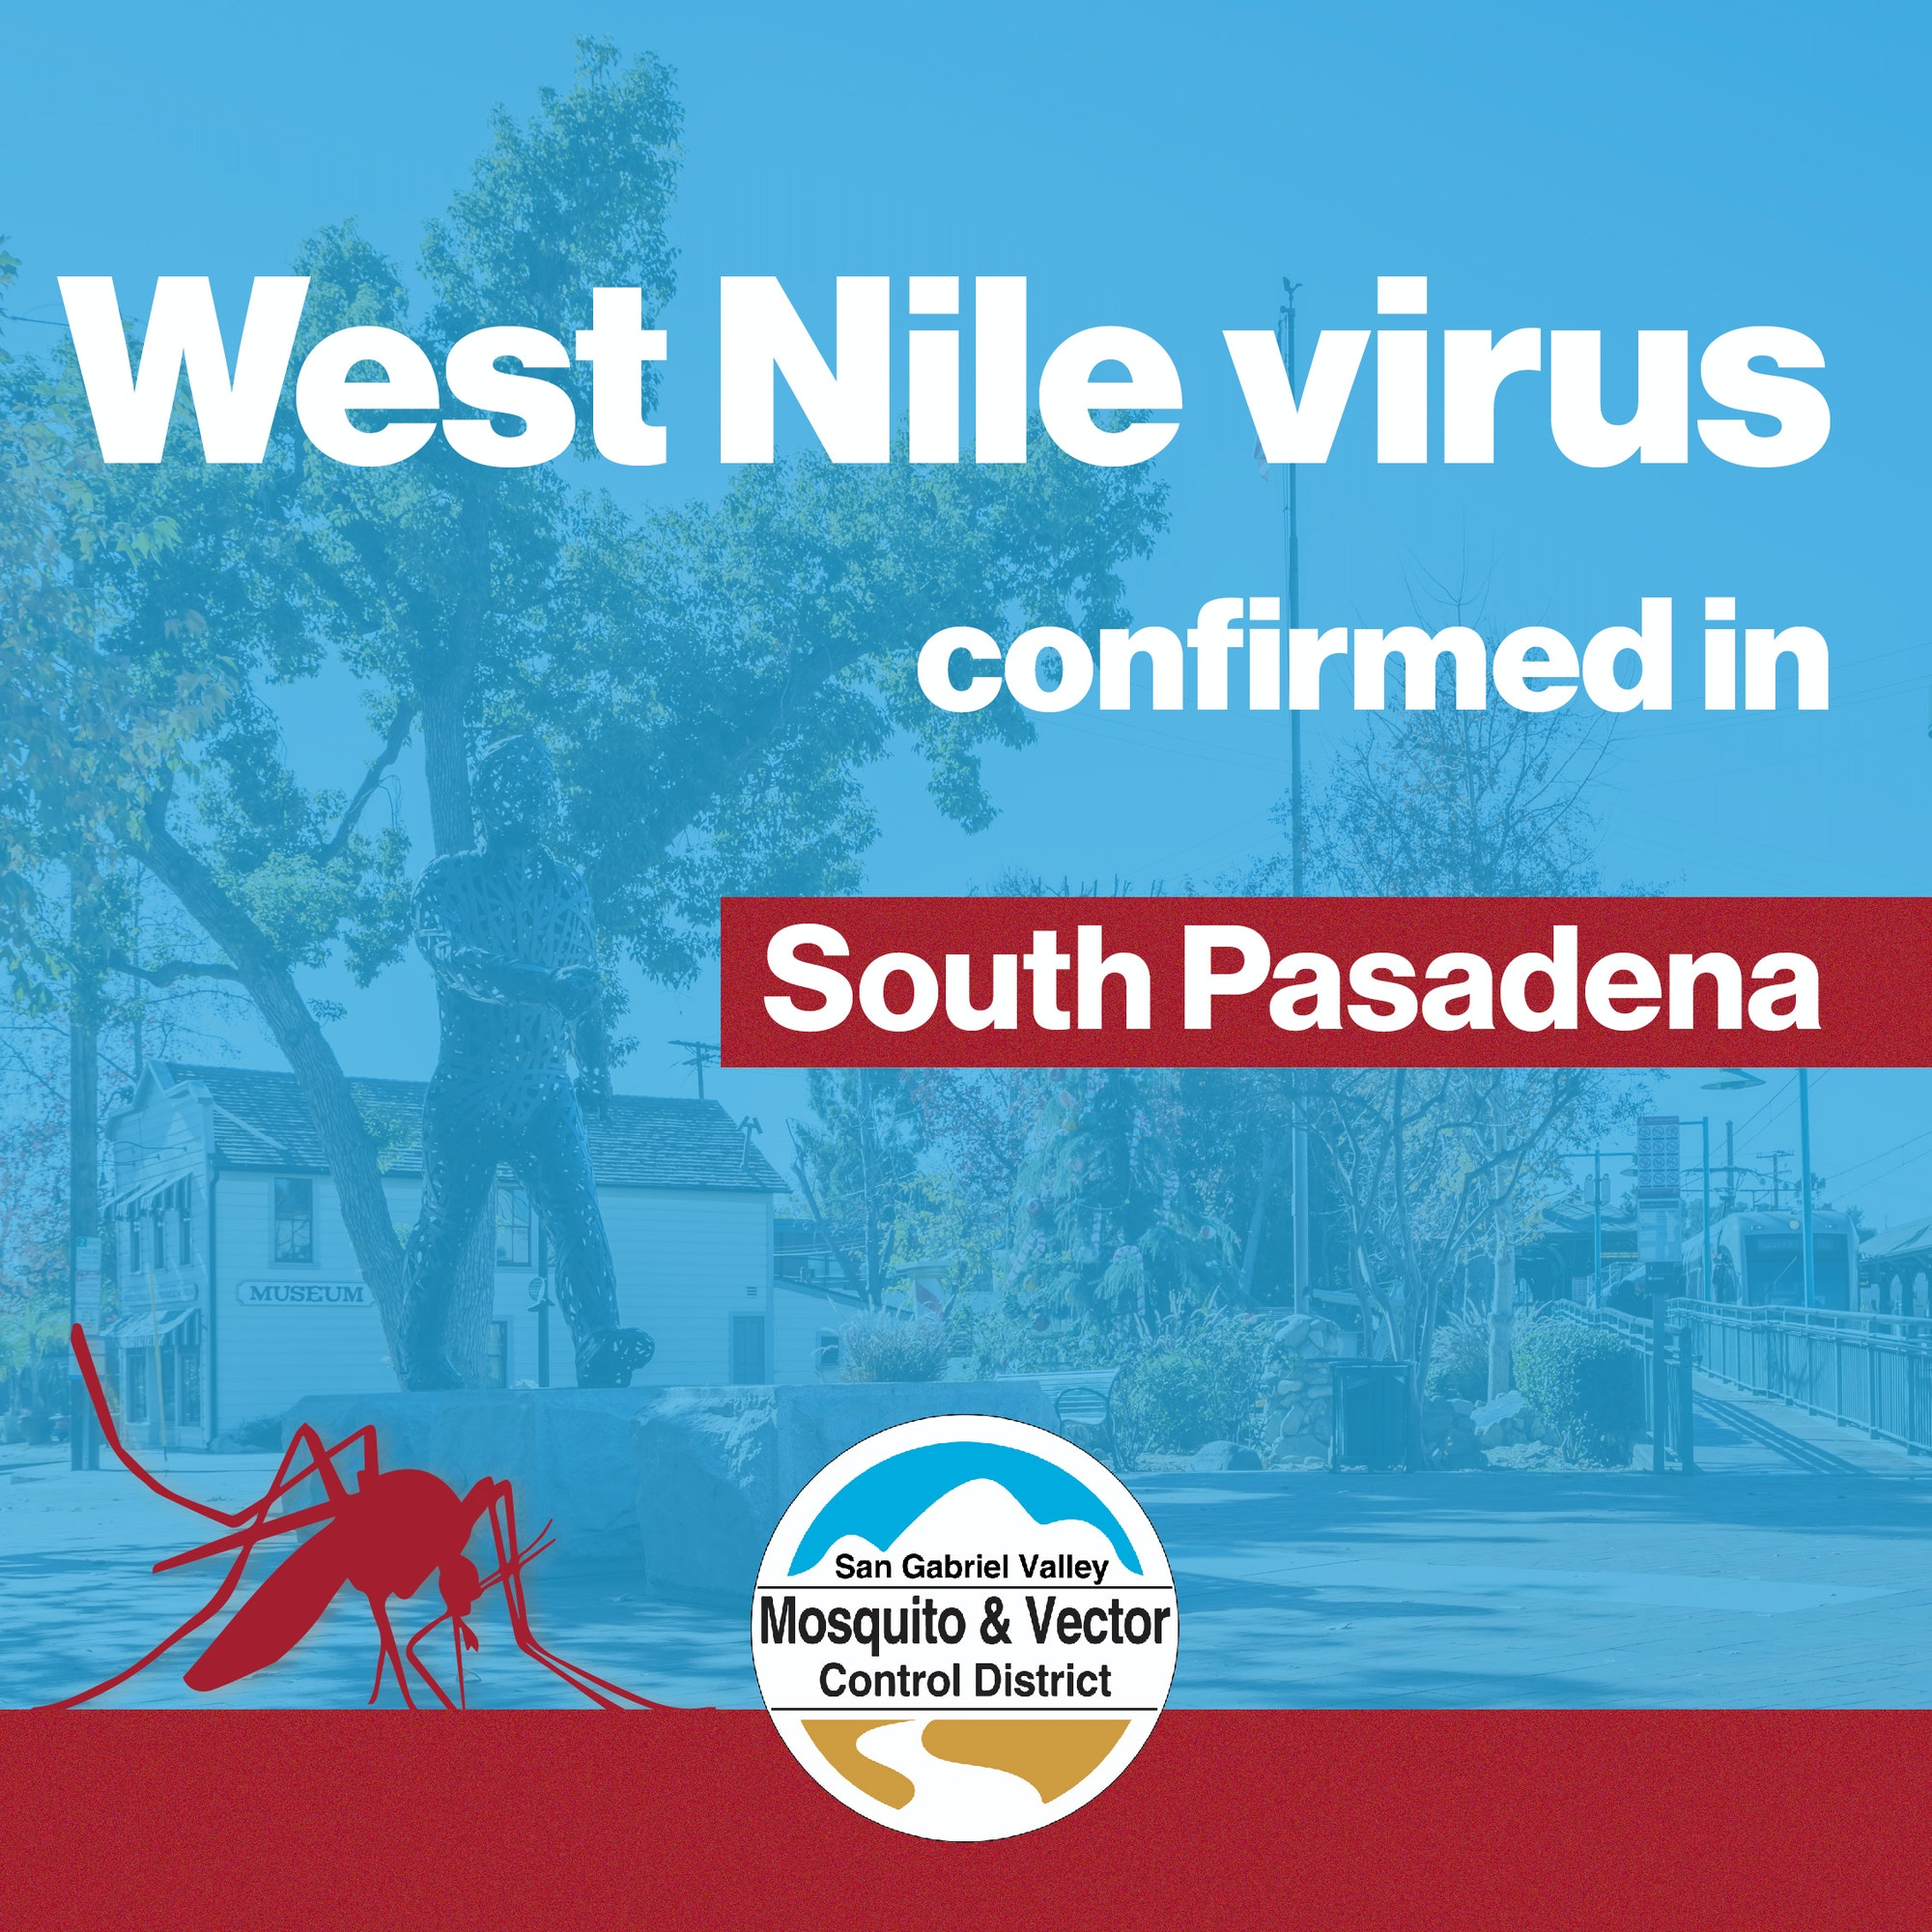 West Nile virus alert banner for South Pasadena